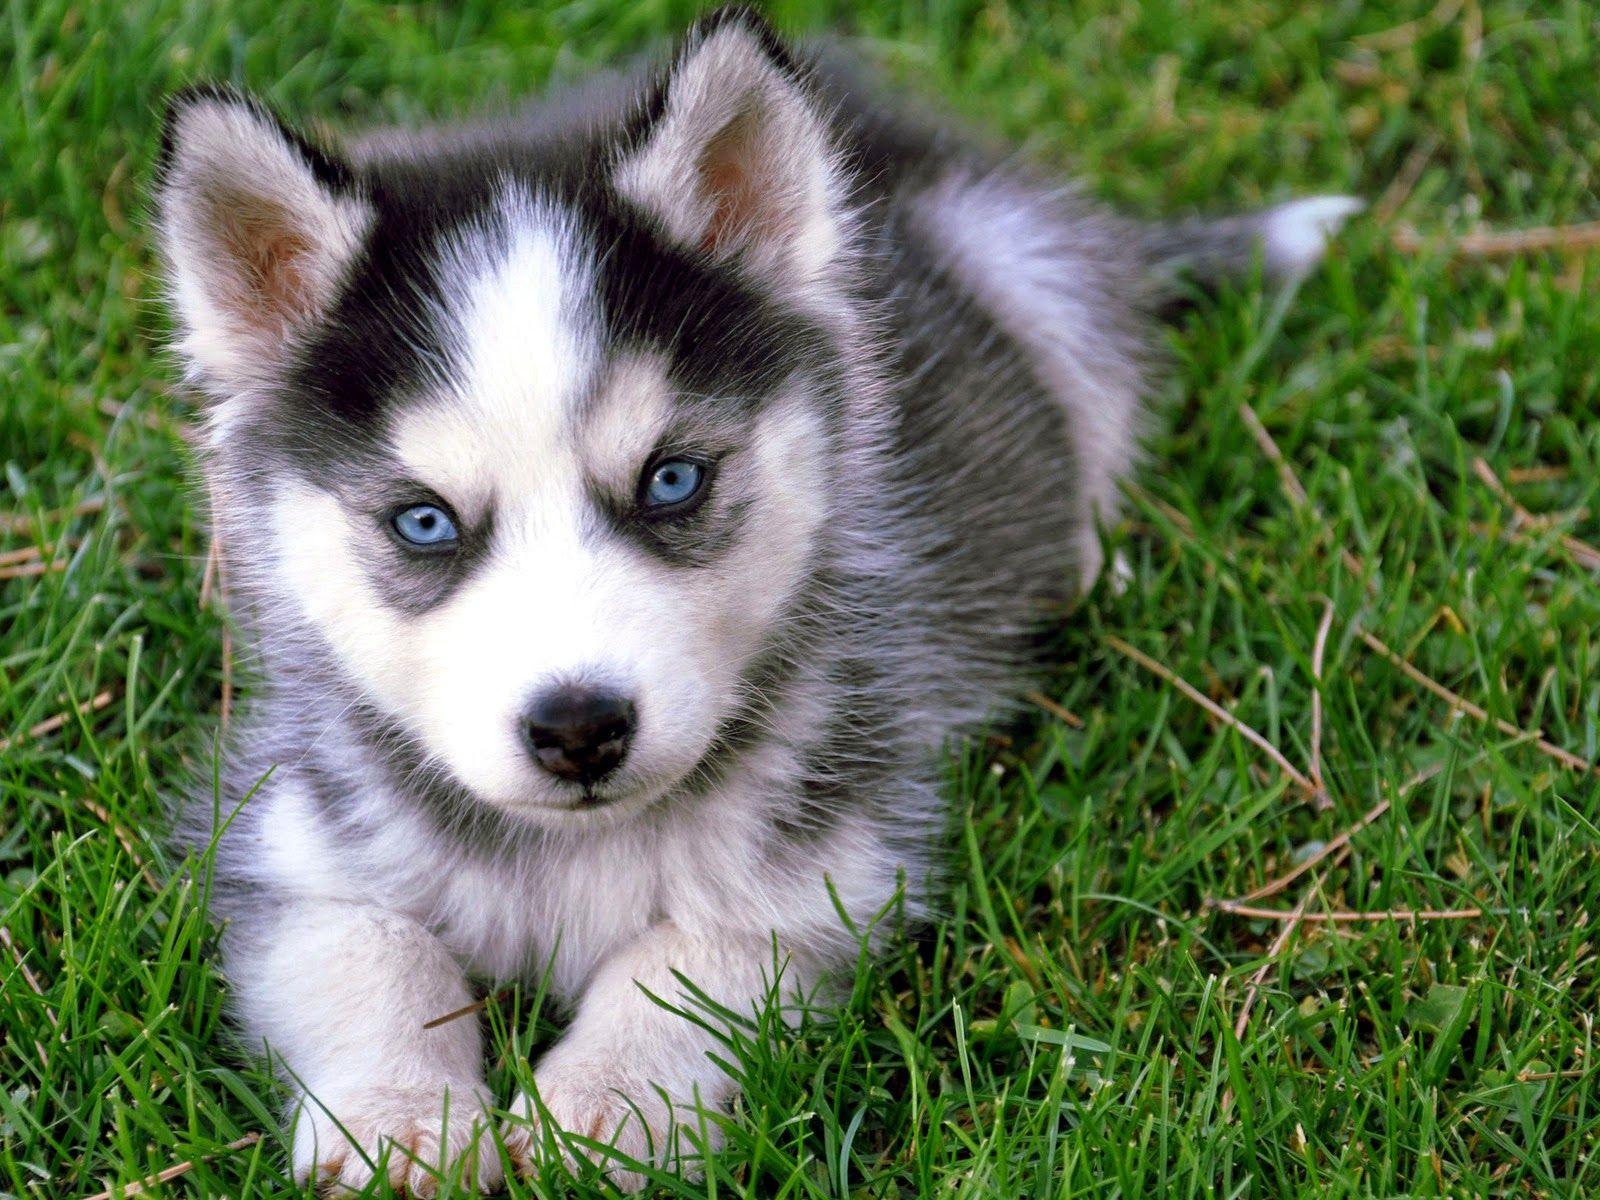 Mudahnya Merawat Anjing Jenis Siberian Husky Binatang Lucu Anak Anjing Lucu Anjing